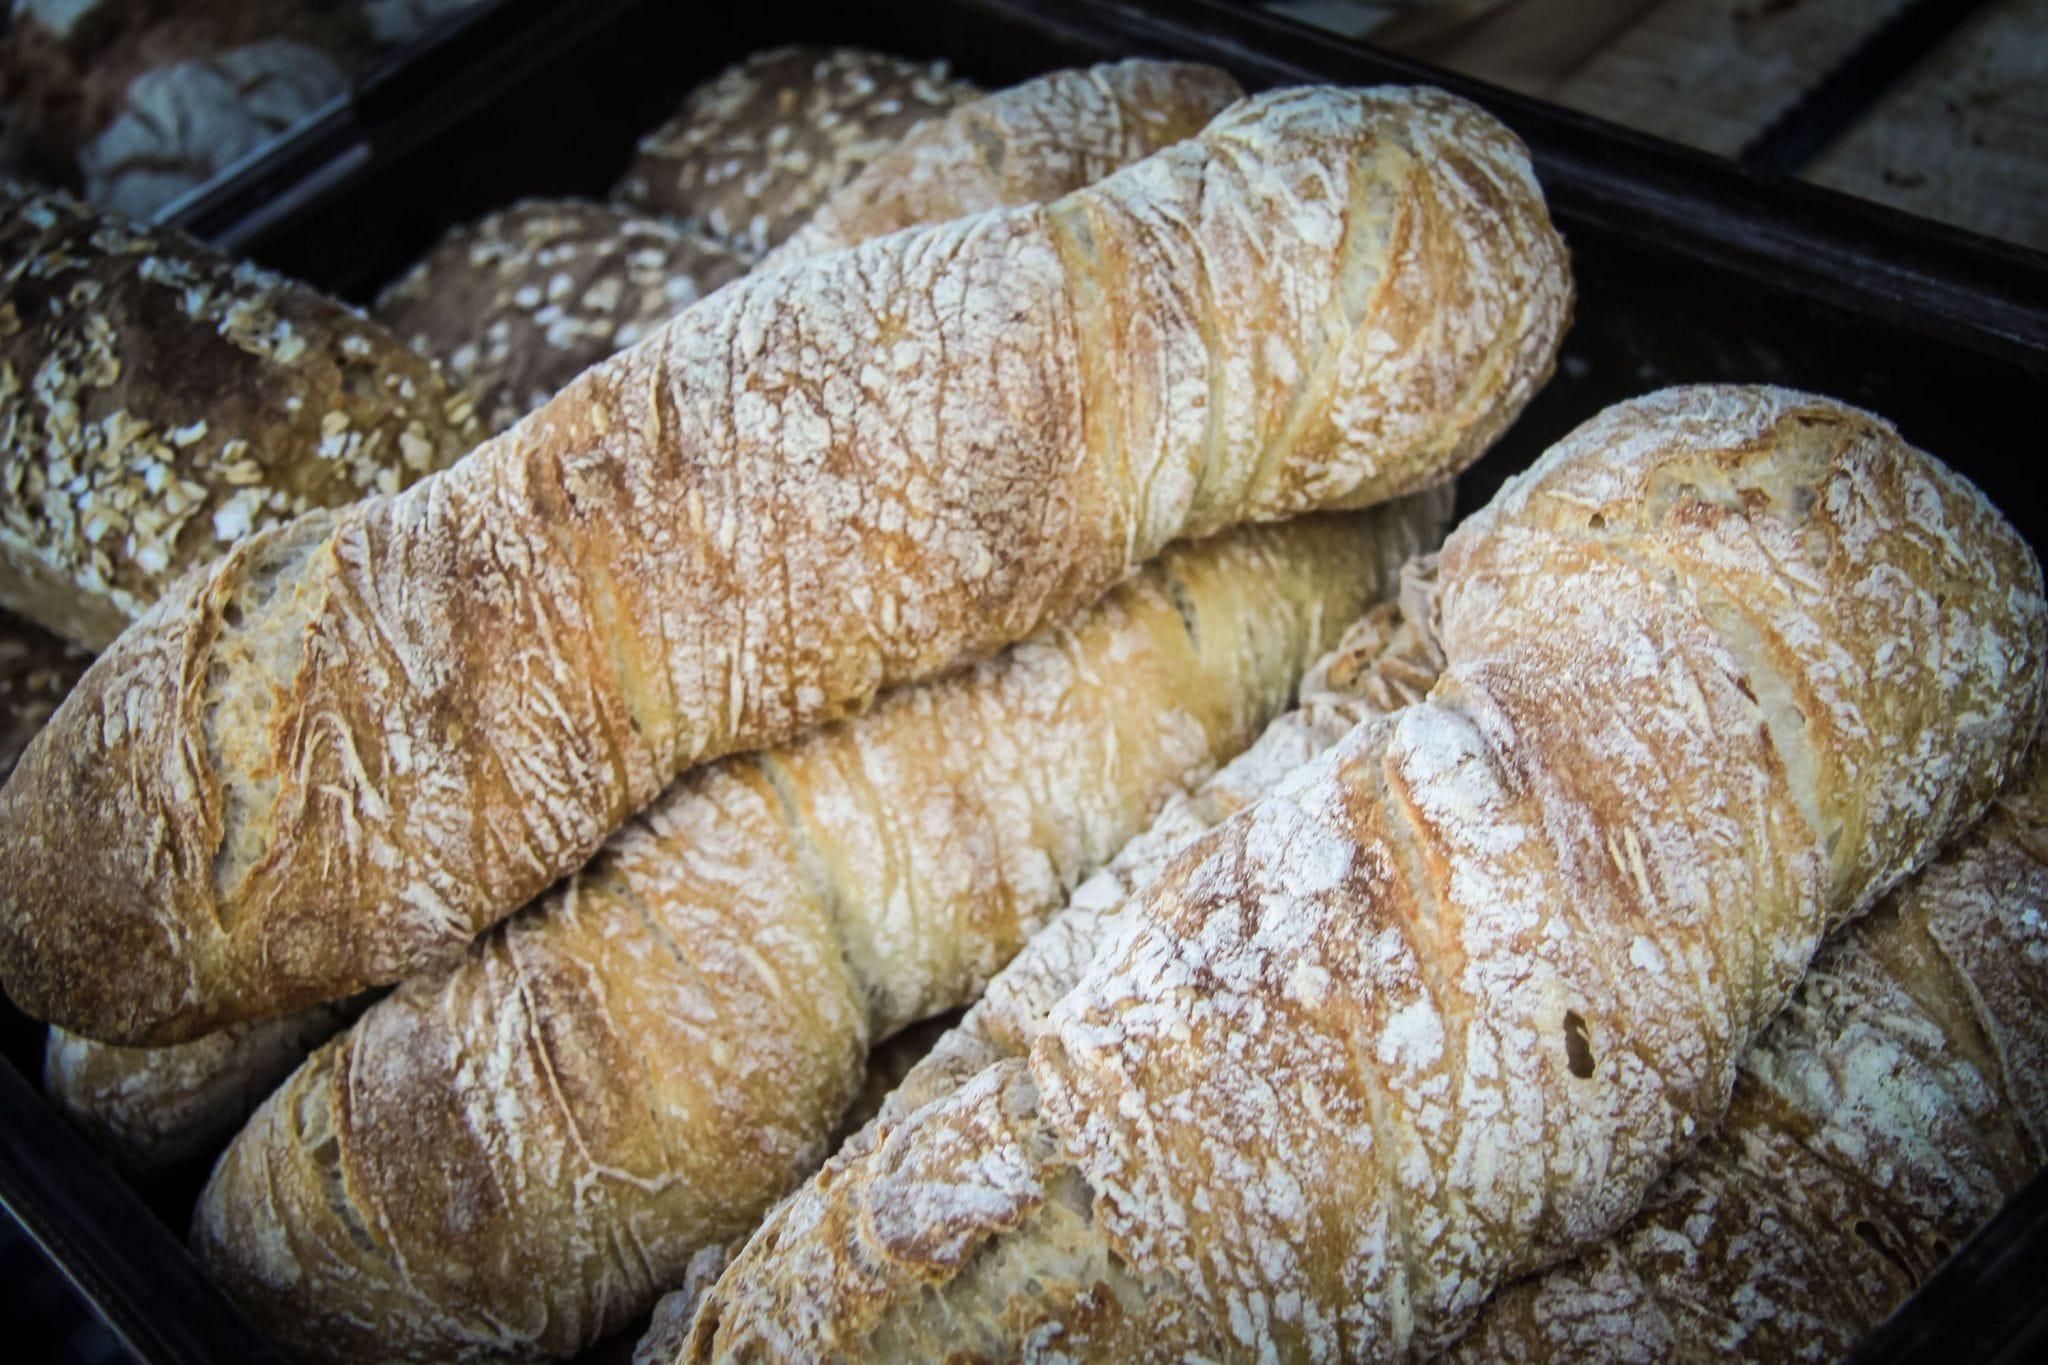 mountain bread pasta mountain bread and pasta farmer's market farmer's food fjardhundraland uppsala 2016 october 07 16 07 33